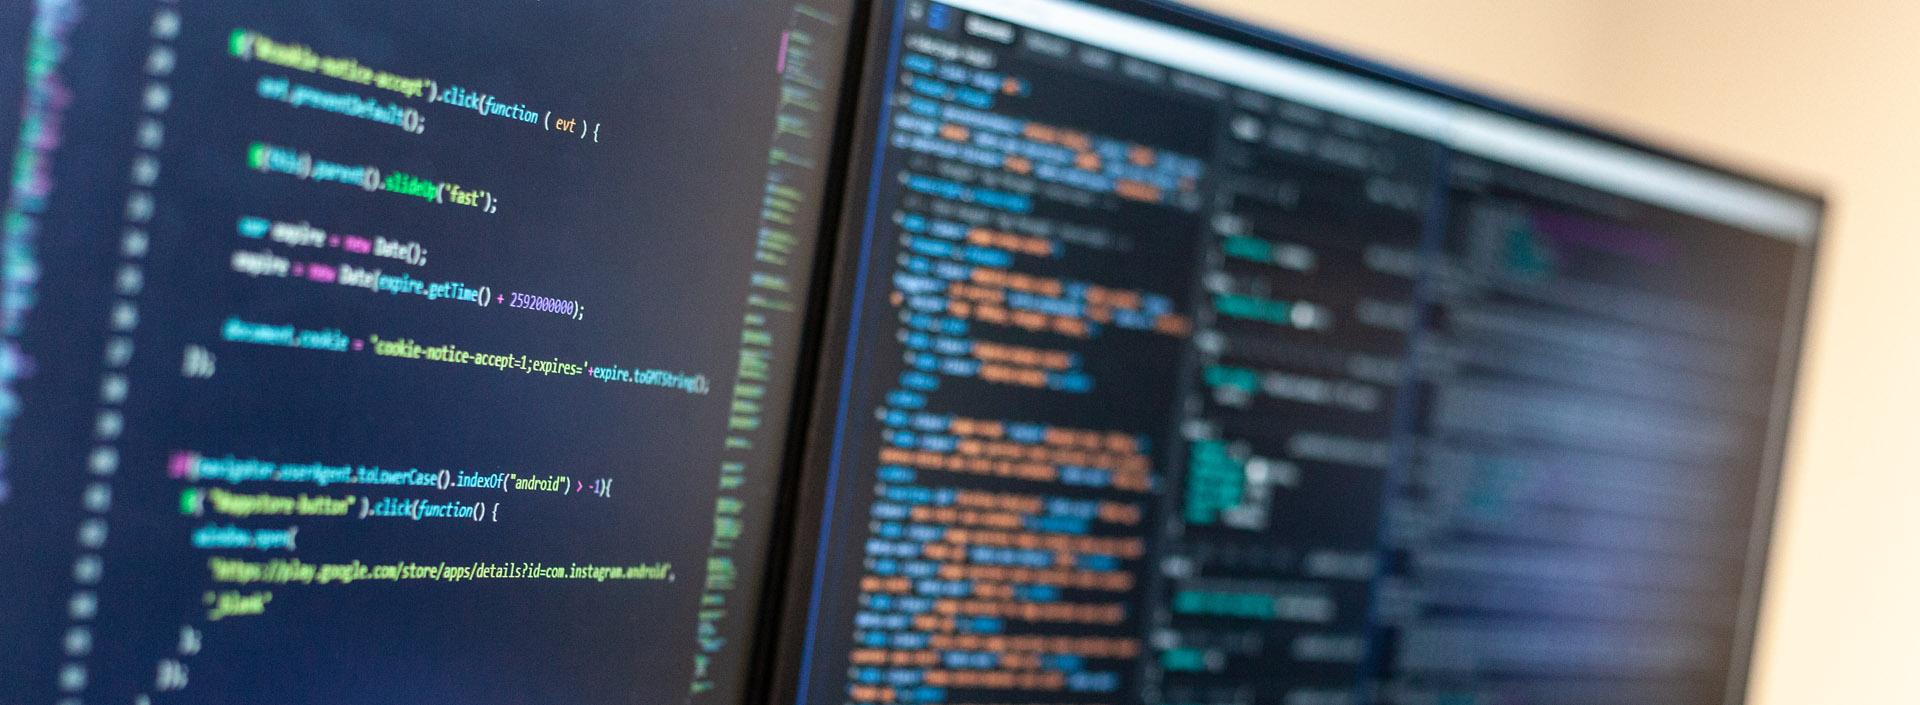 Laravel Code on a computer screen